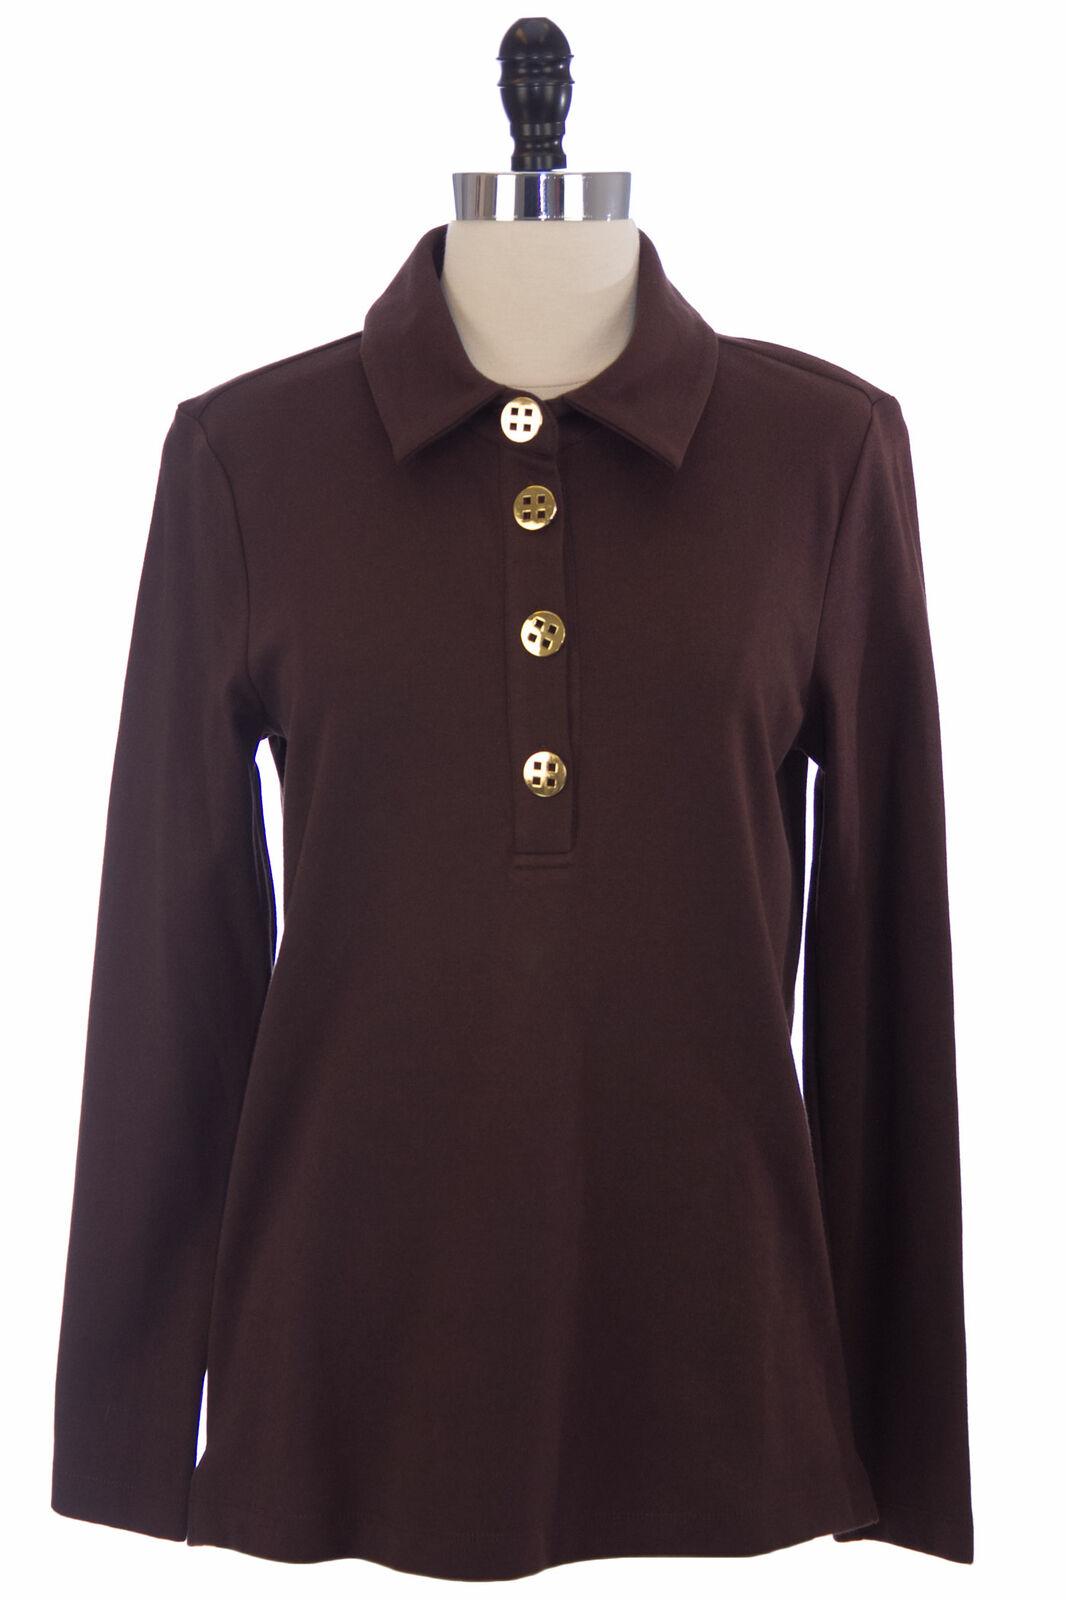 Elizabeth Mckay Schokolade Baumwollmischung Langärmlig Polohemd 7053 Nwt